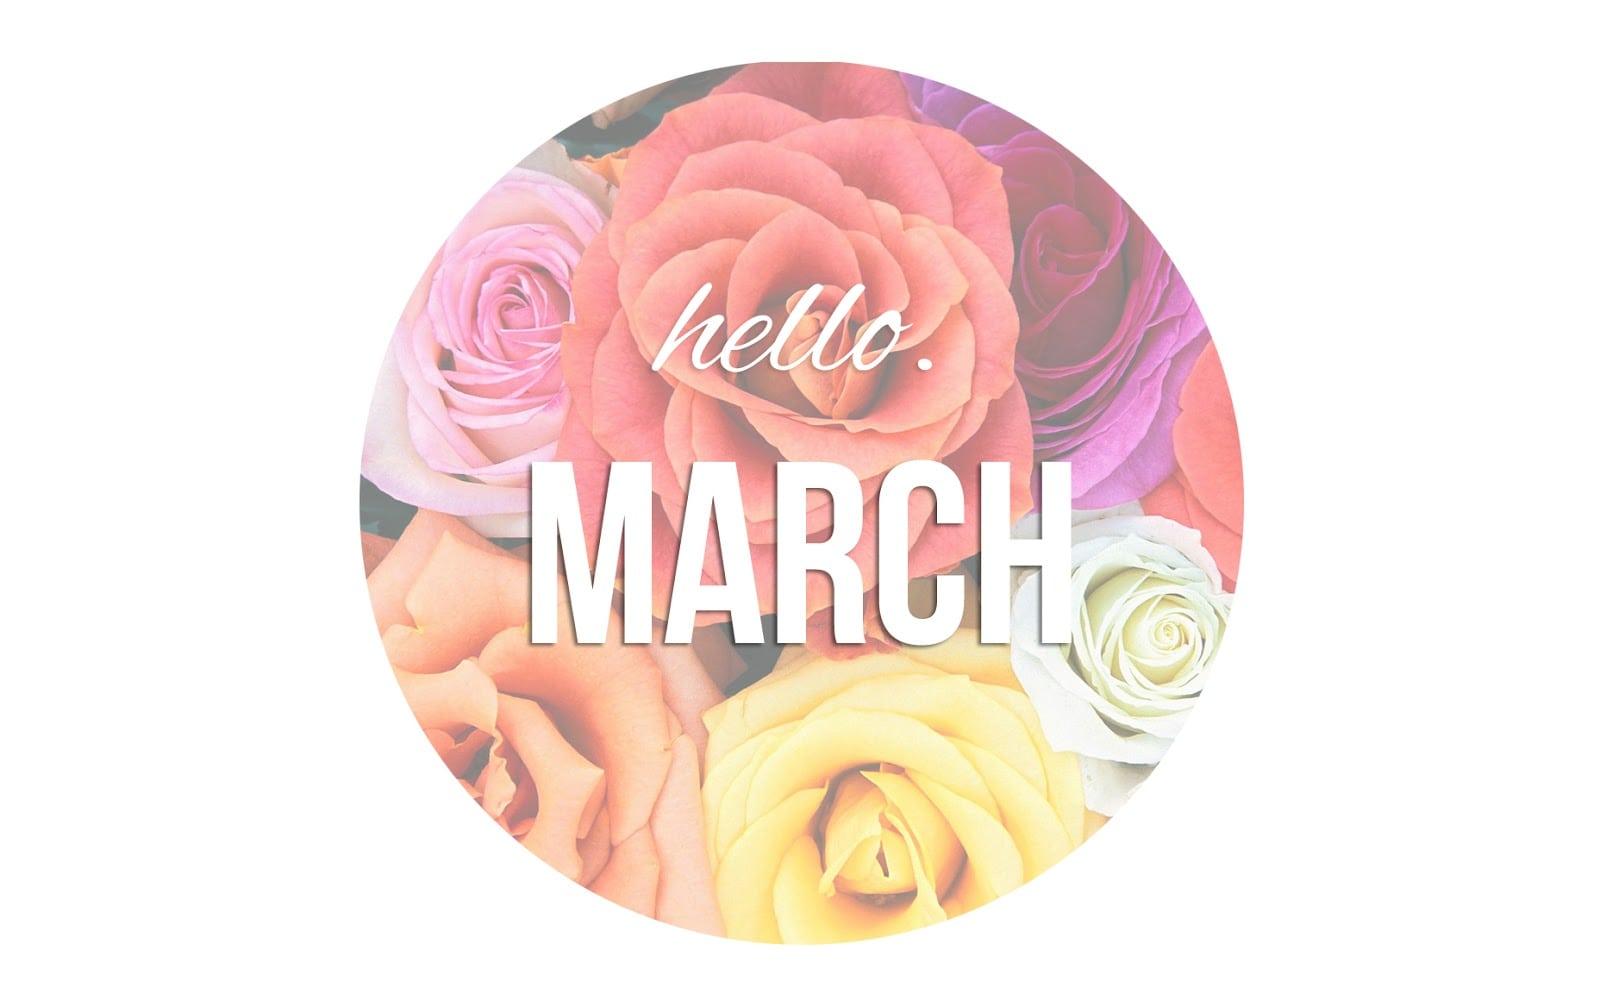 Hello-march-beautiful-image